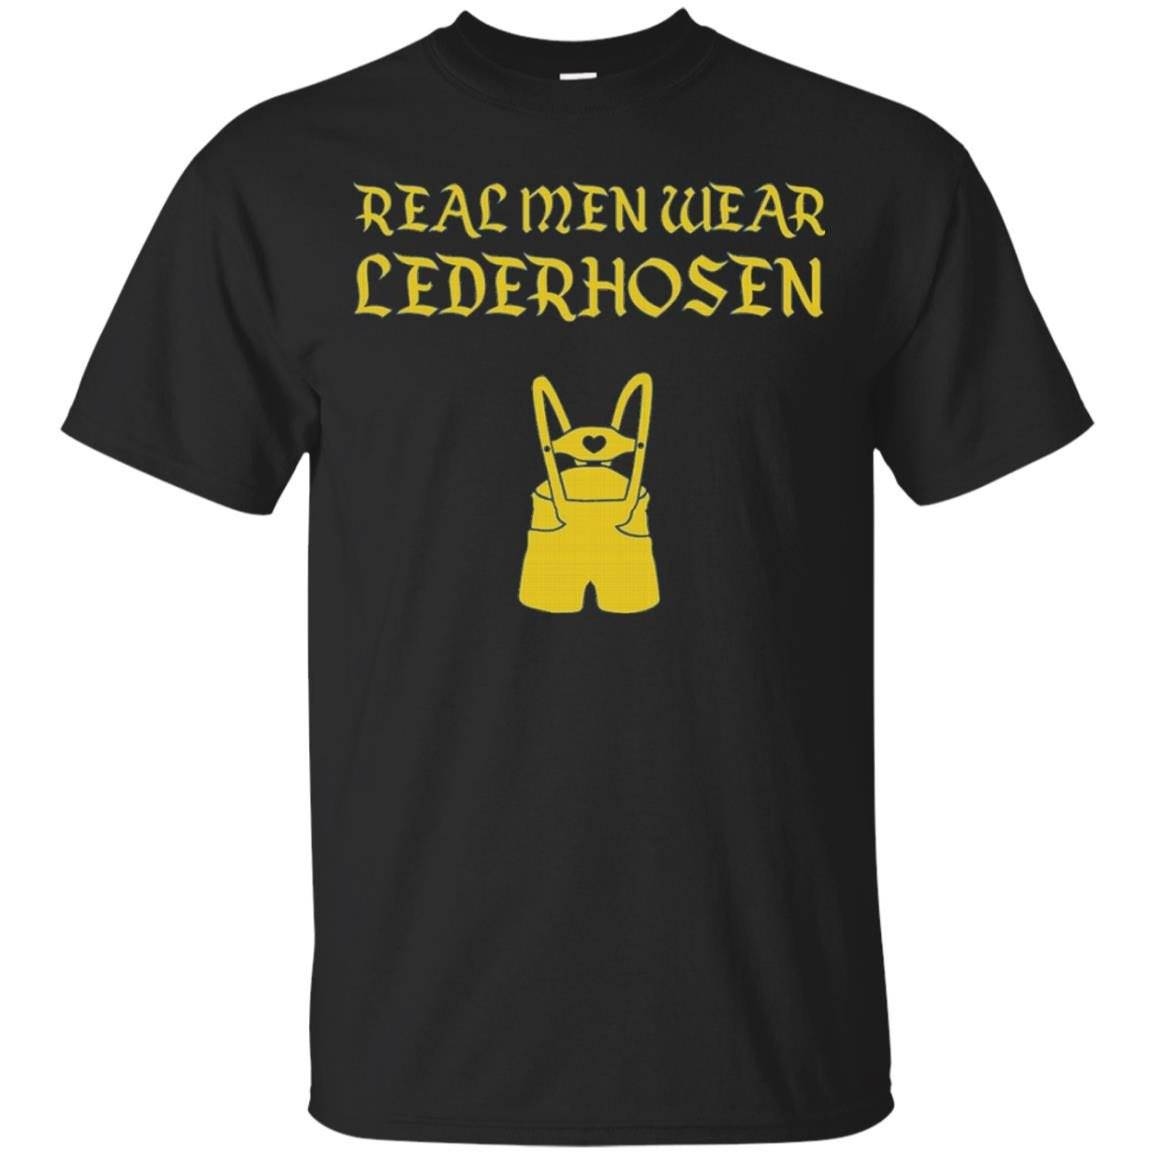 Men's Real Men Wear Lederhosen – Funny Oktoberfest Party Shirt